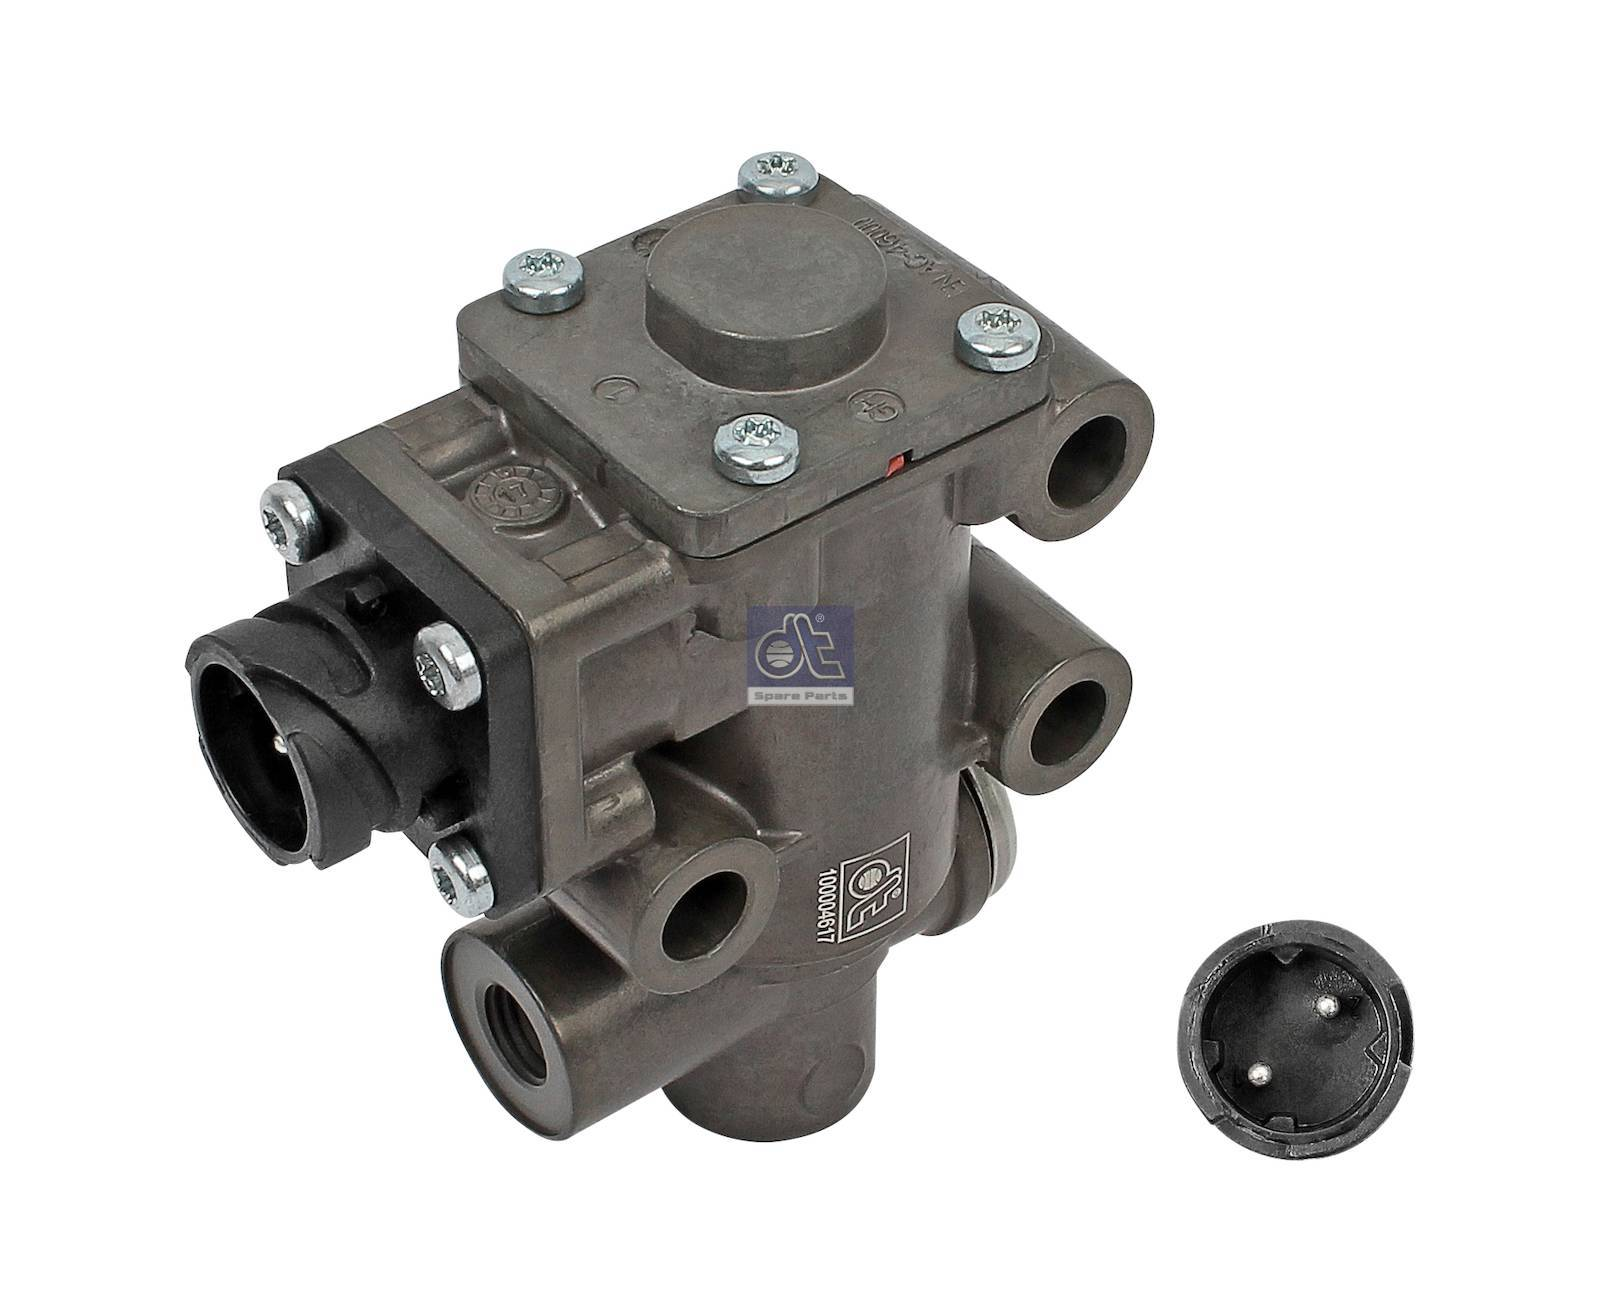 Solenoid valve, exhaust gas recirculation